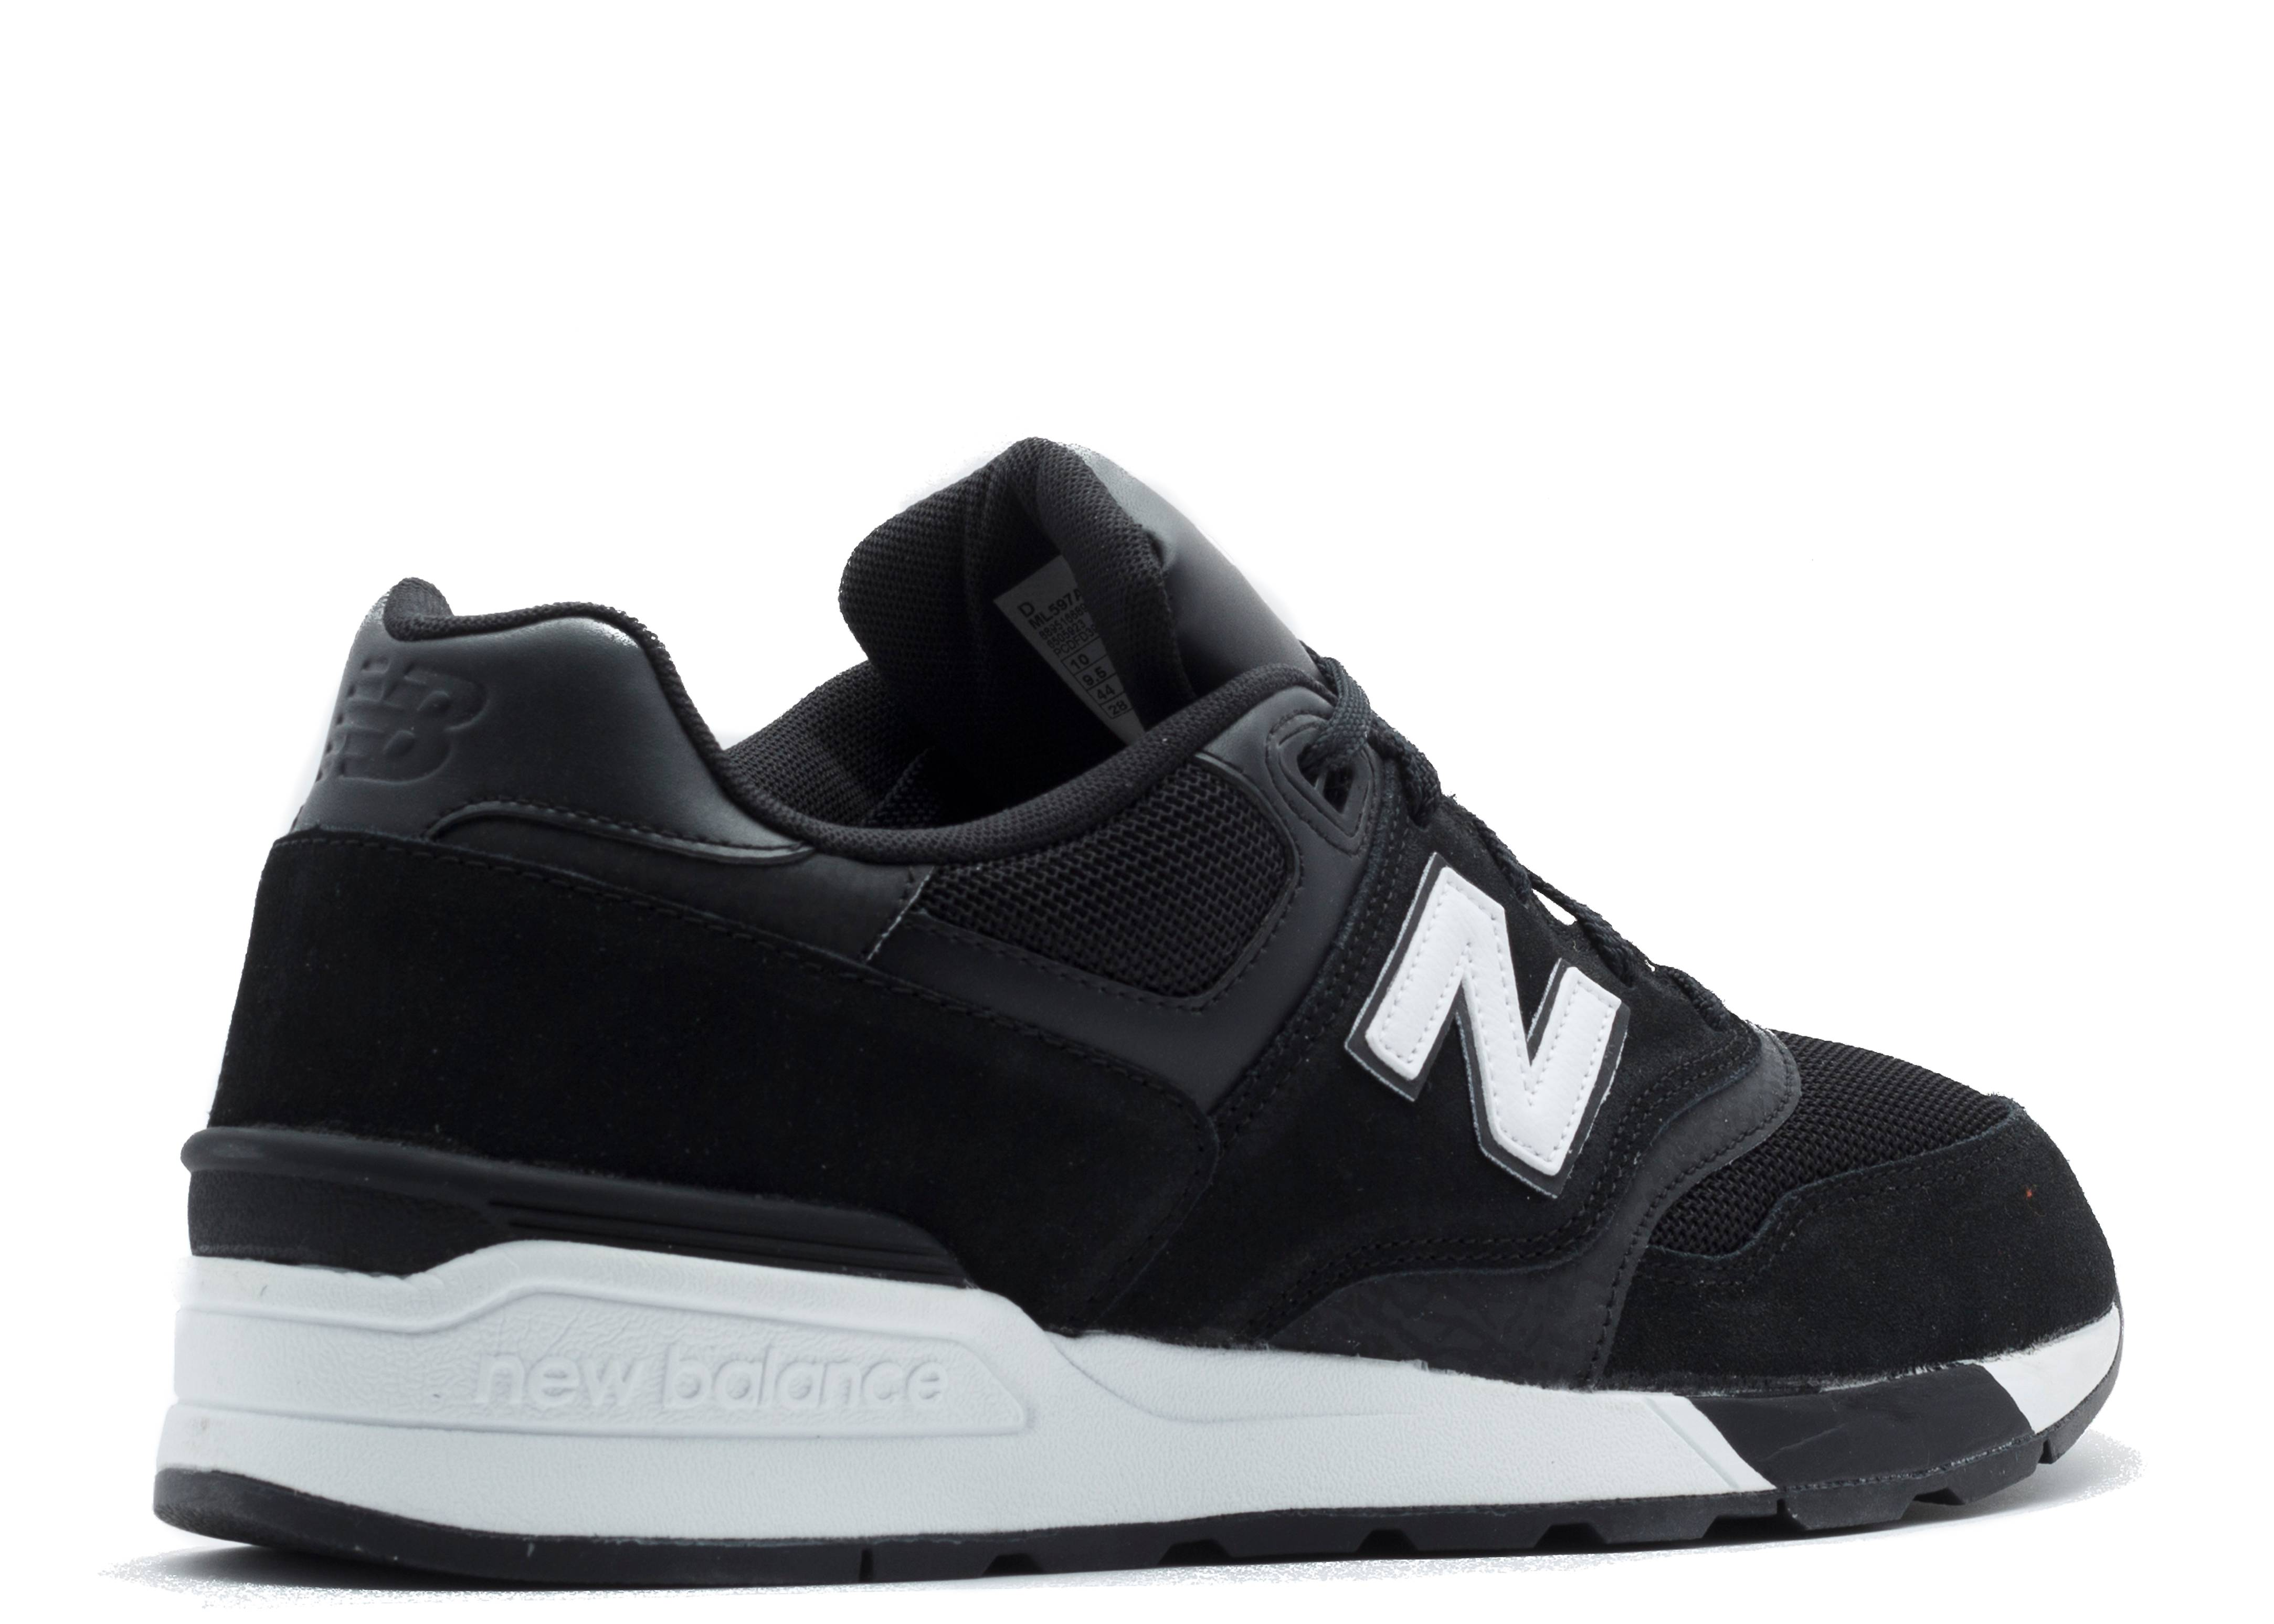 best sneakers 0e9fb 7a70e Ml597 - New Balance - ml597aac - black/white | Flight Club